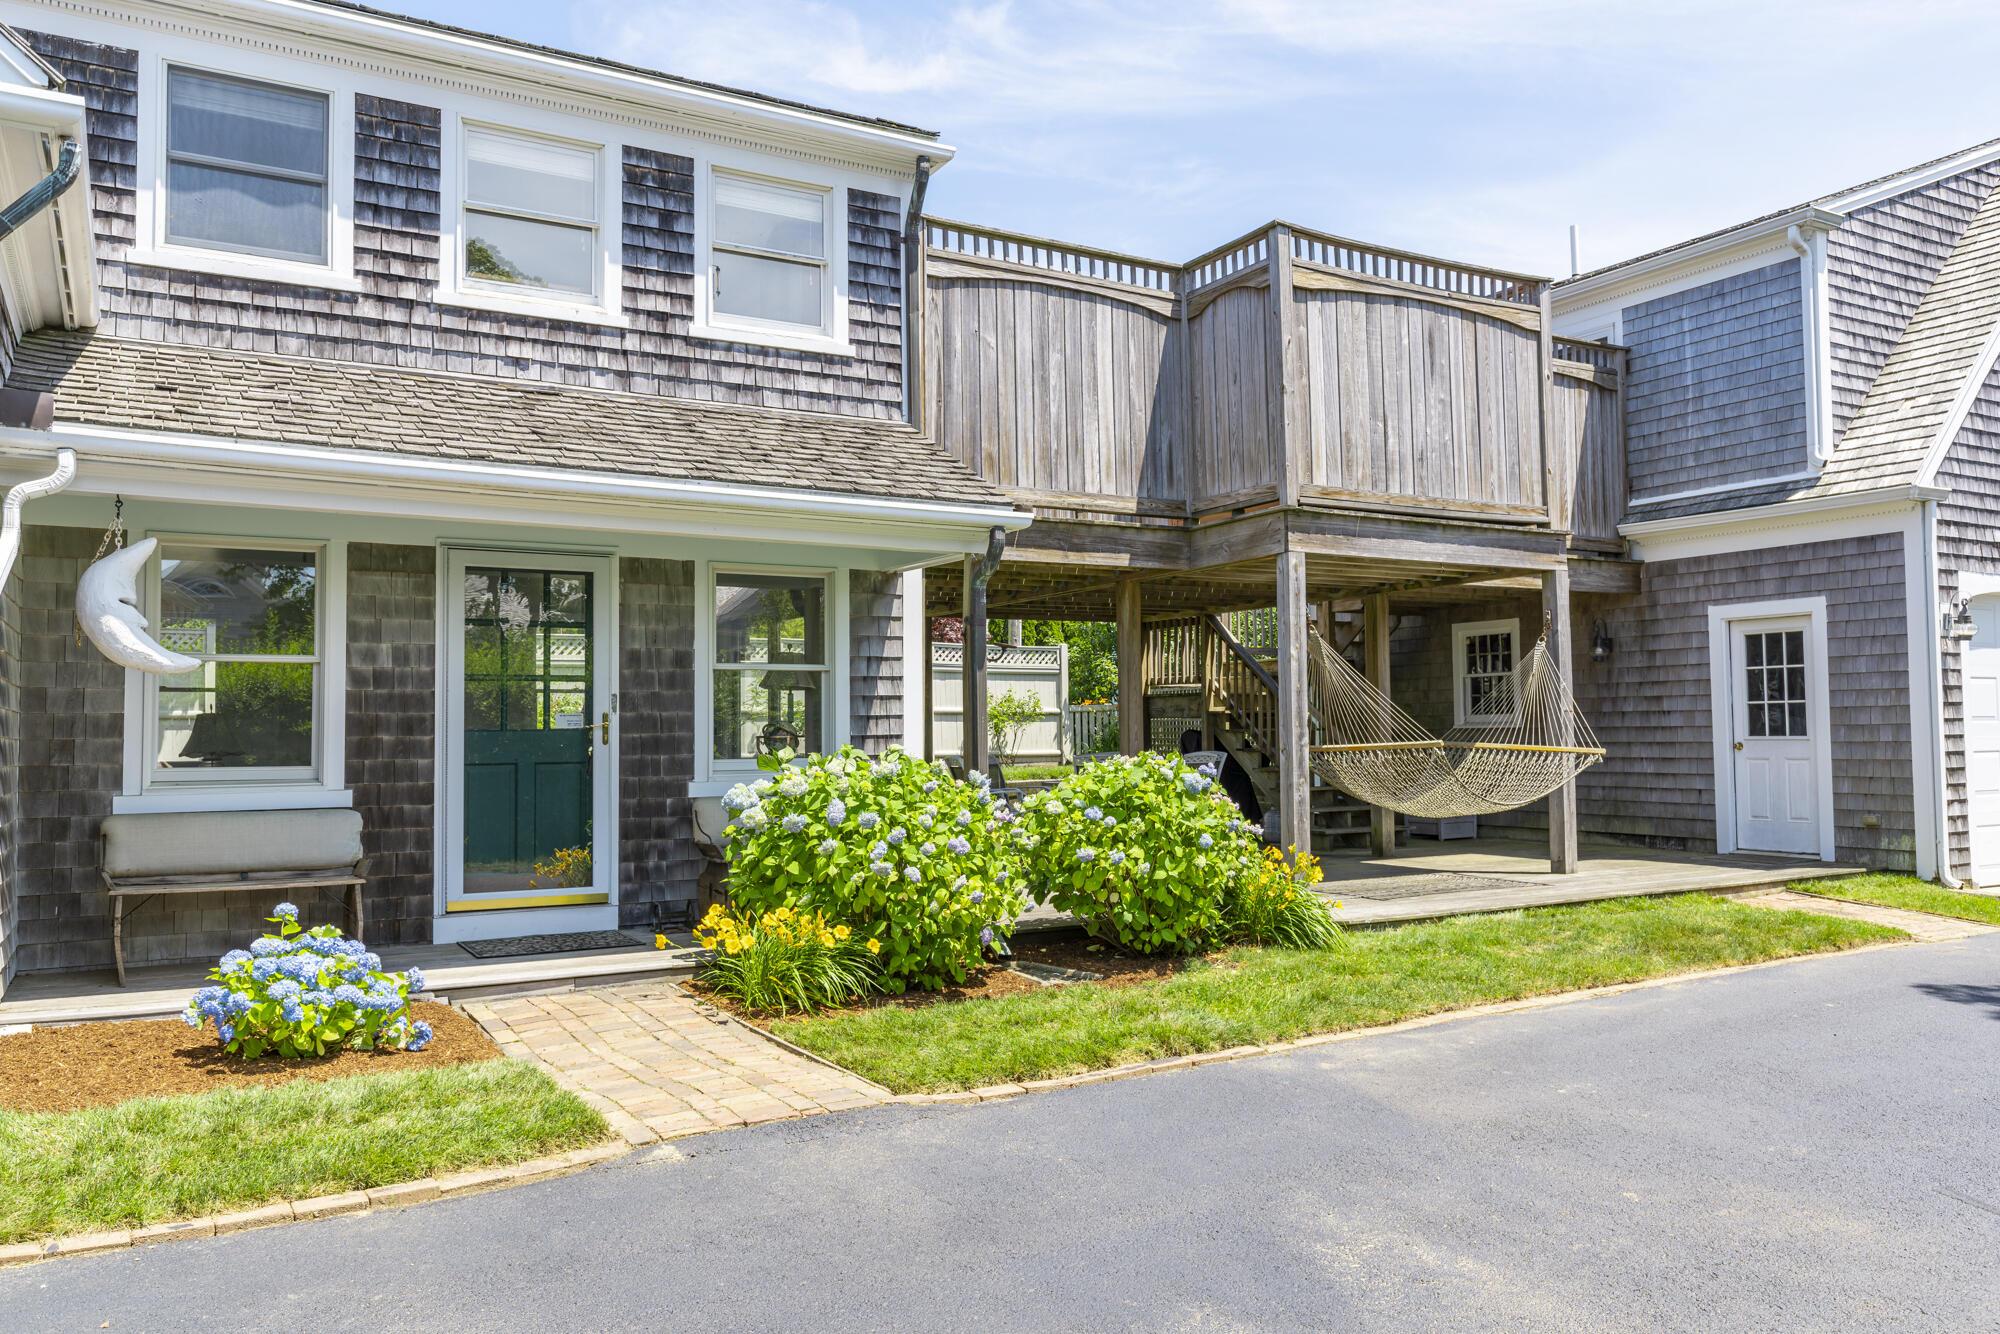 90 Seaview Street, Chatham, MA  02633 - slide 45